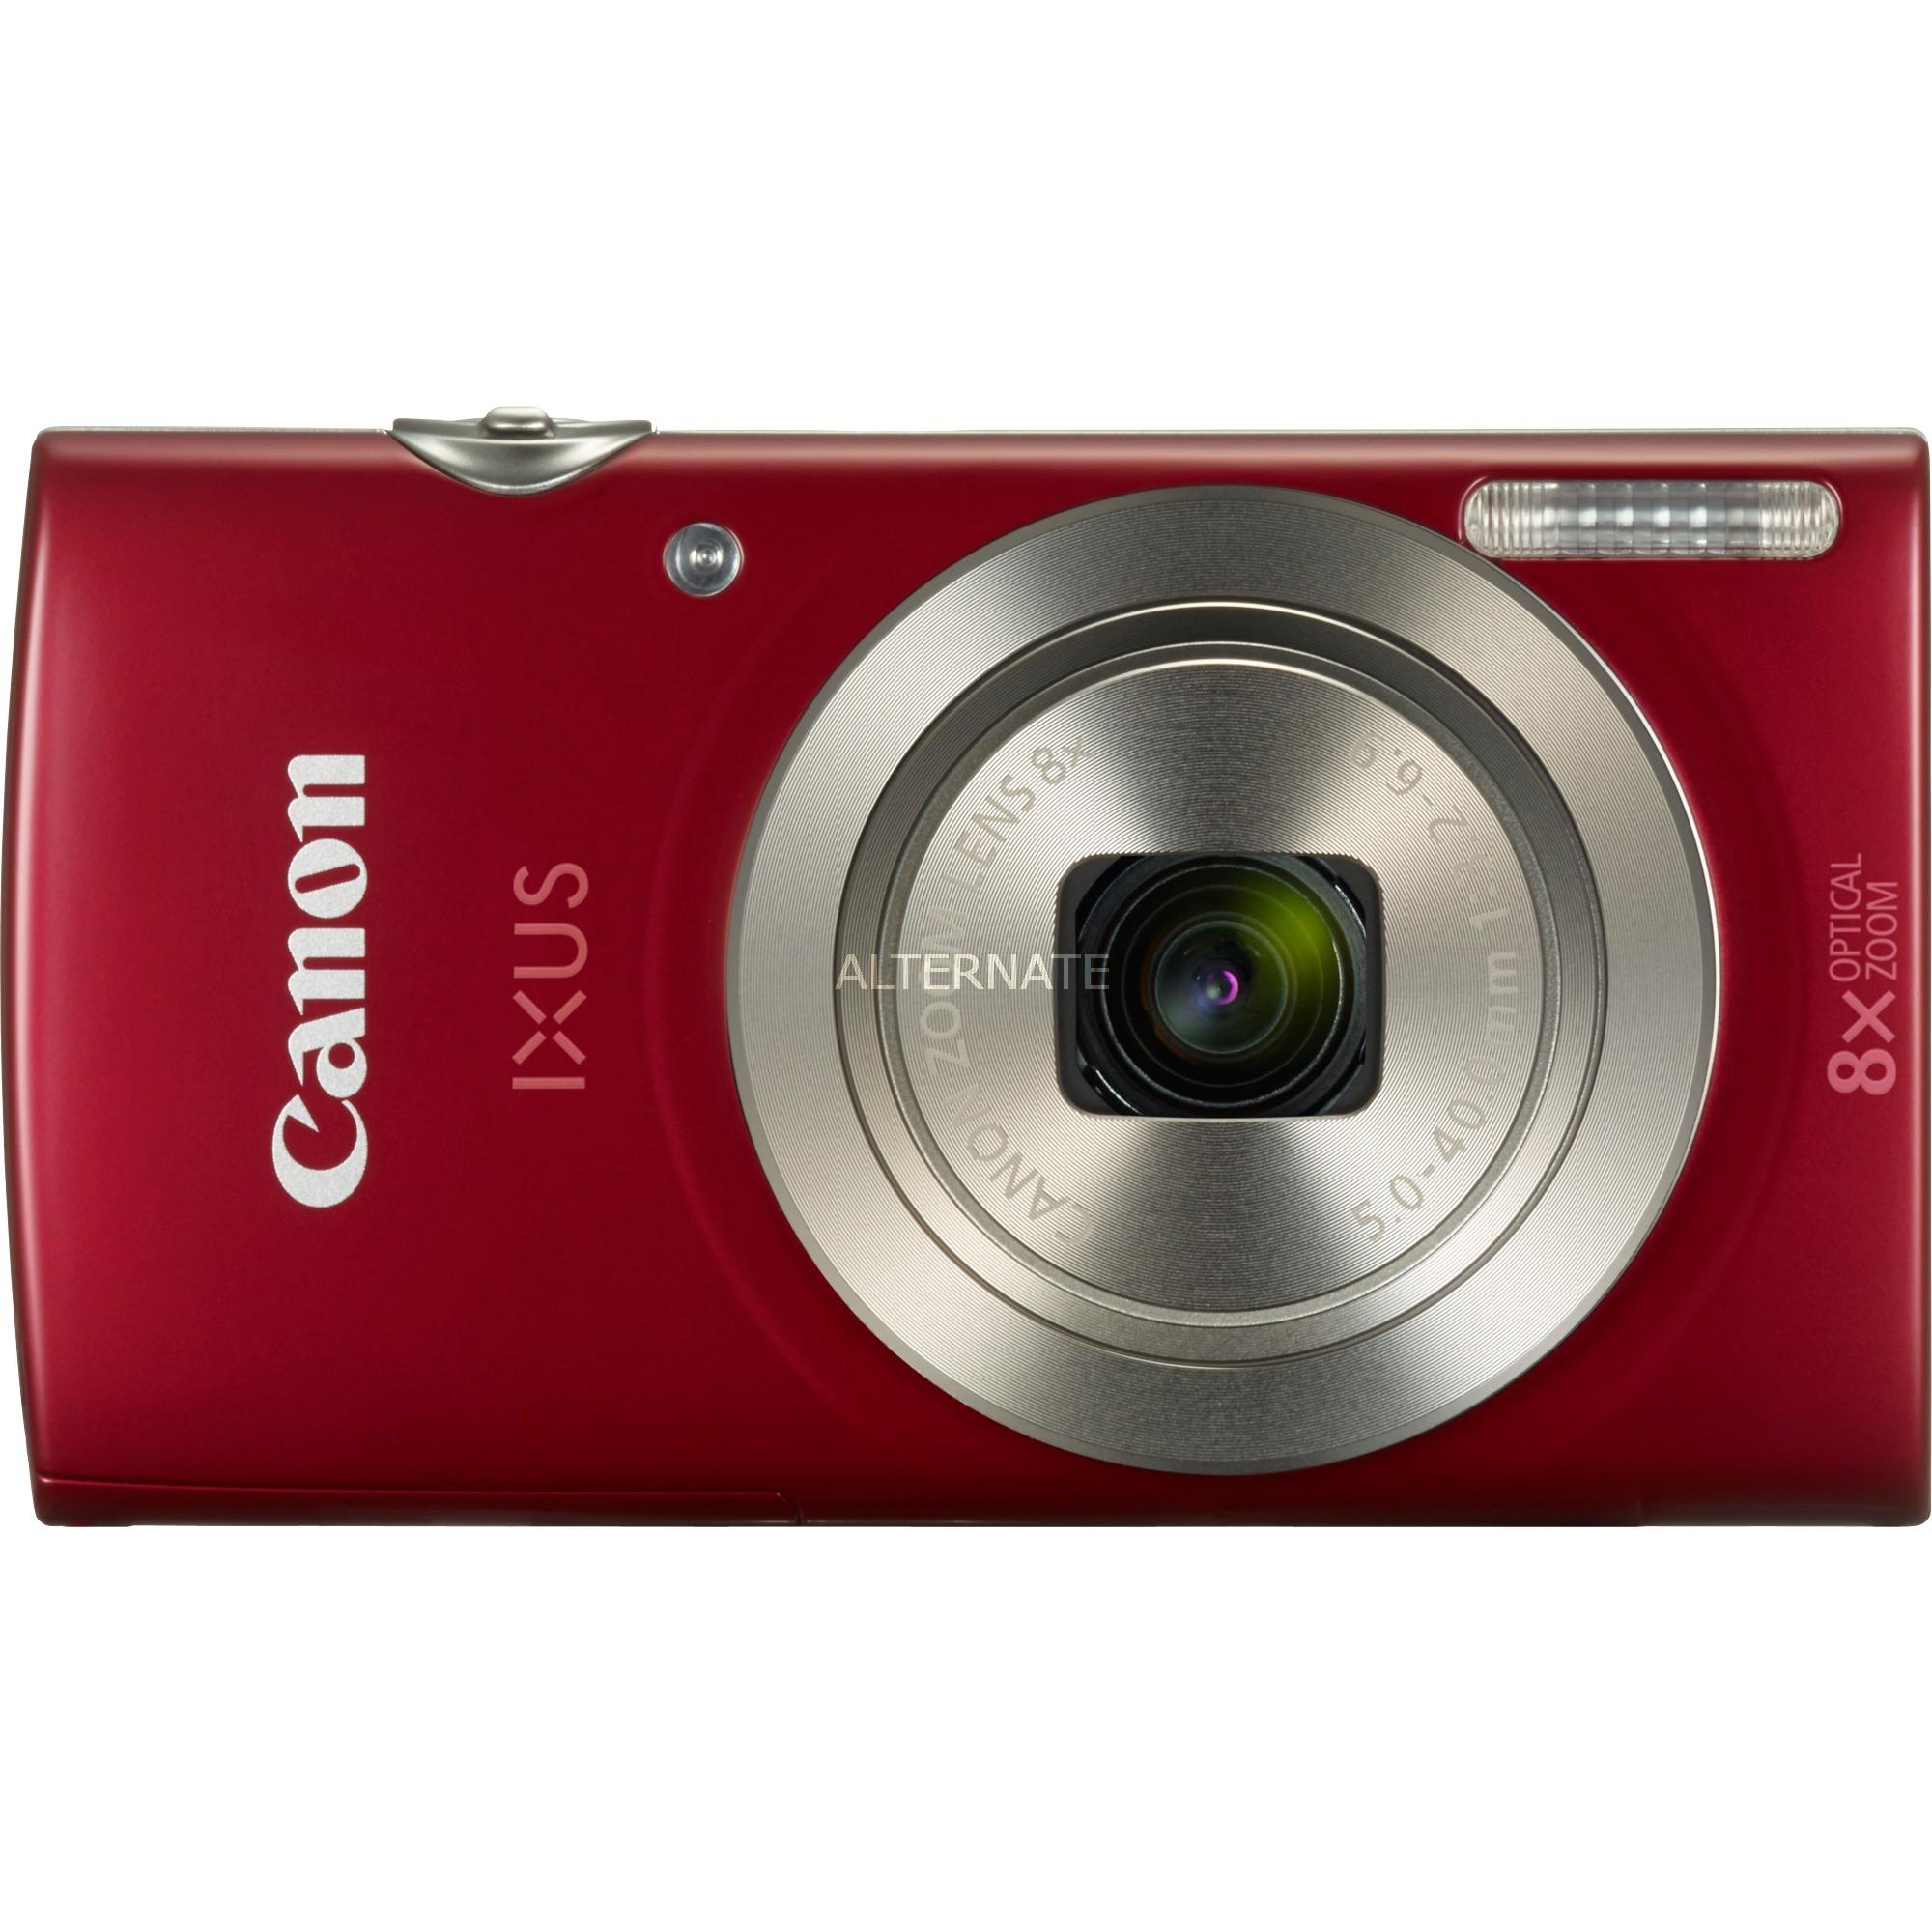 "Digital IXUS 185 Cámara compacta 20 MP 1/2.3"" CCD 5152 x 3864 Pixeles Rojo, Cámara digital"